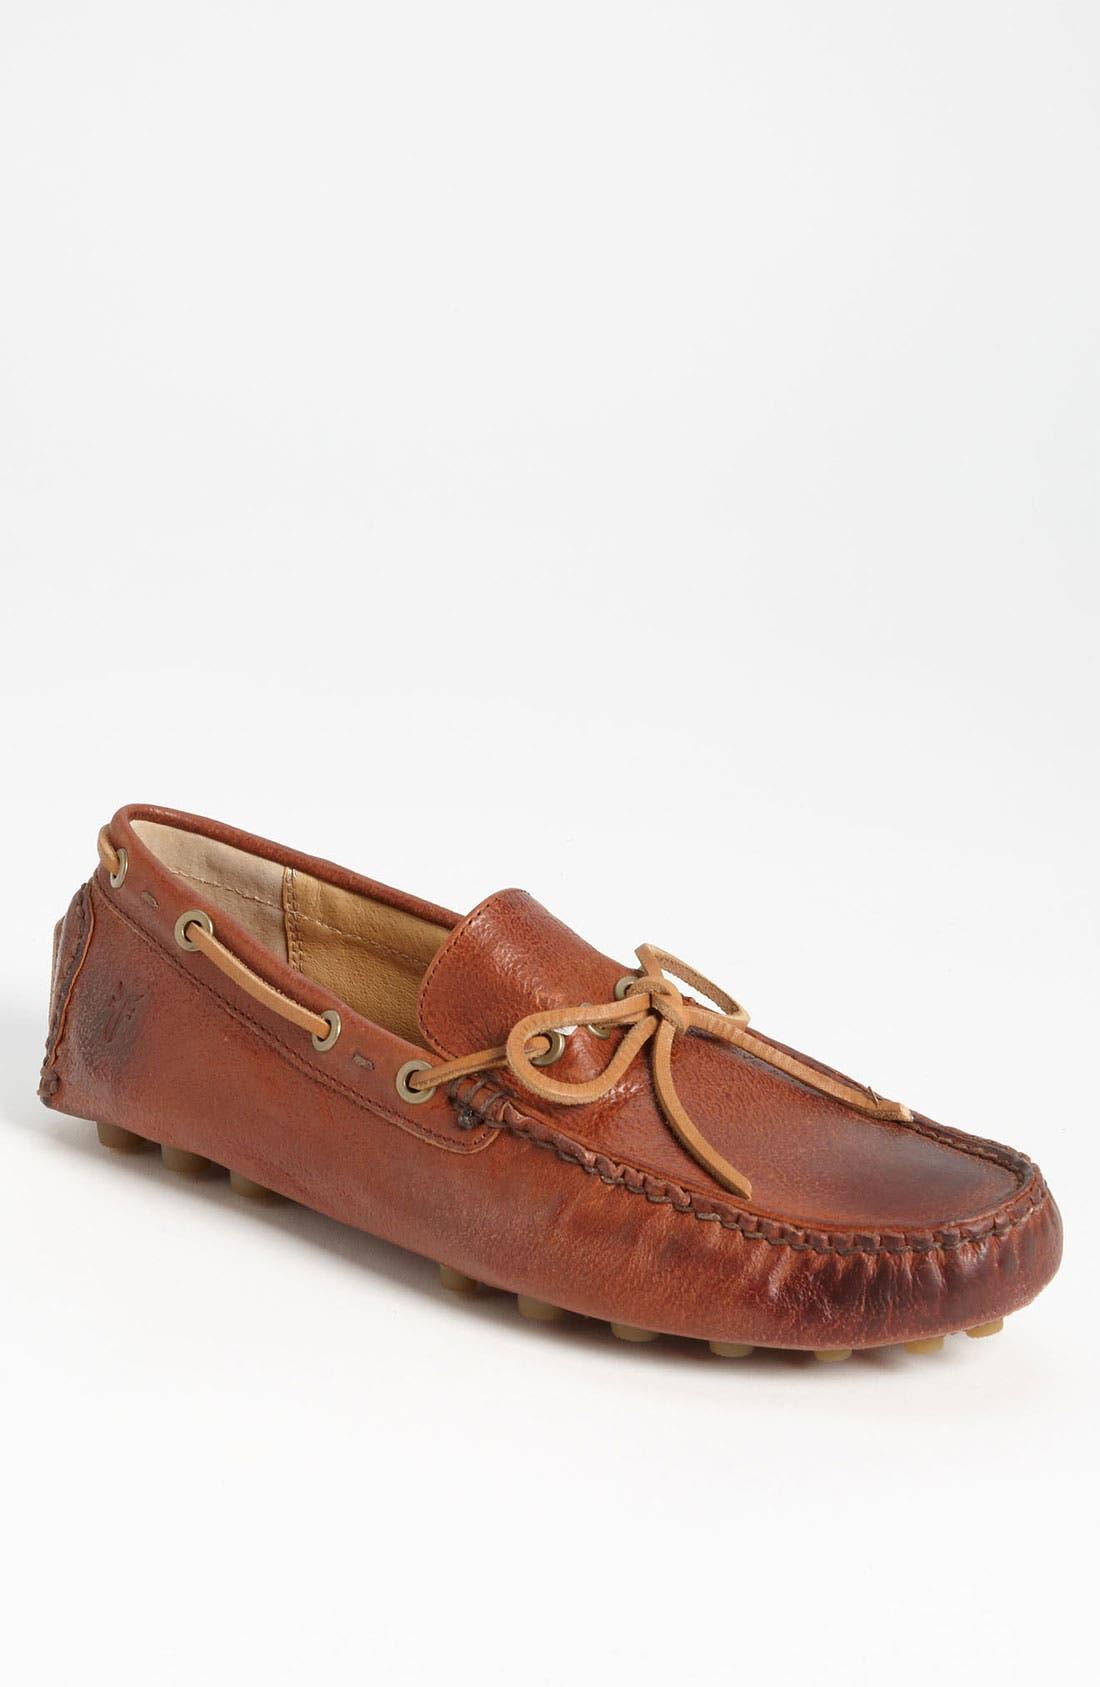 Main Image - Frye 'Russel' Driving Shoe